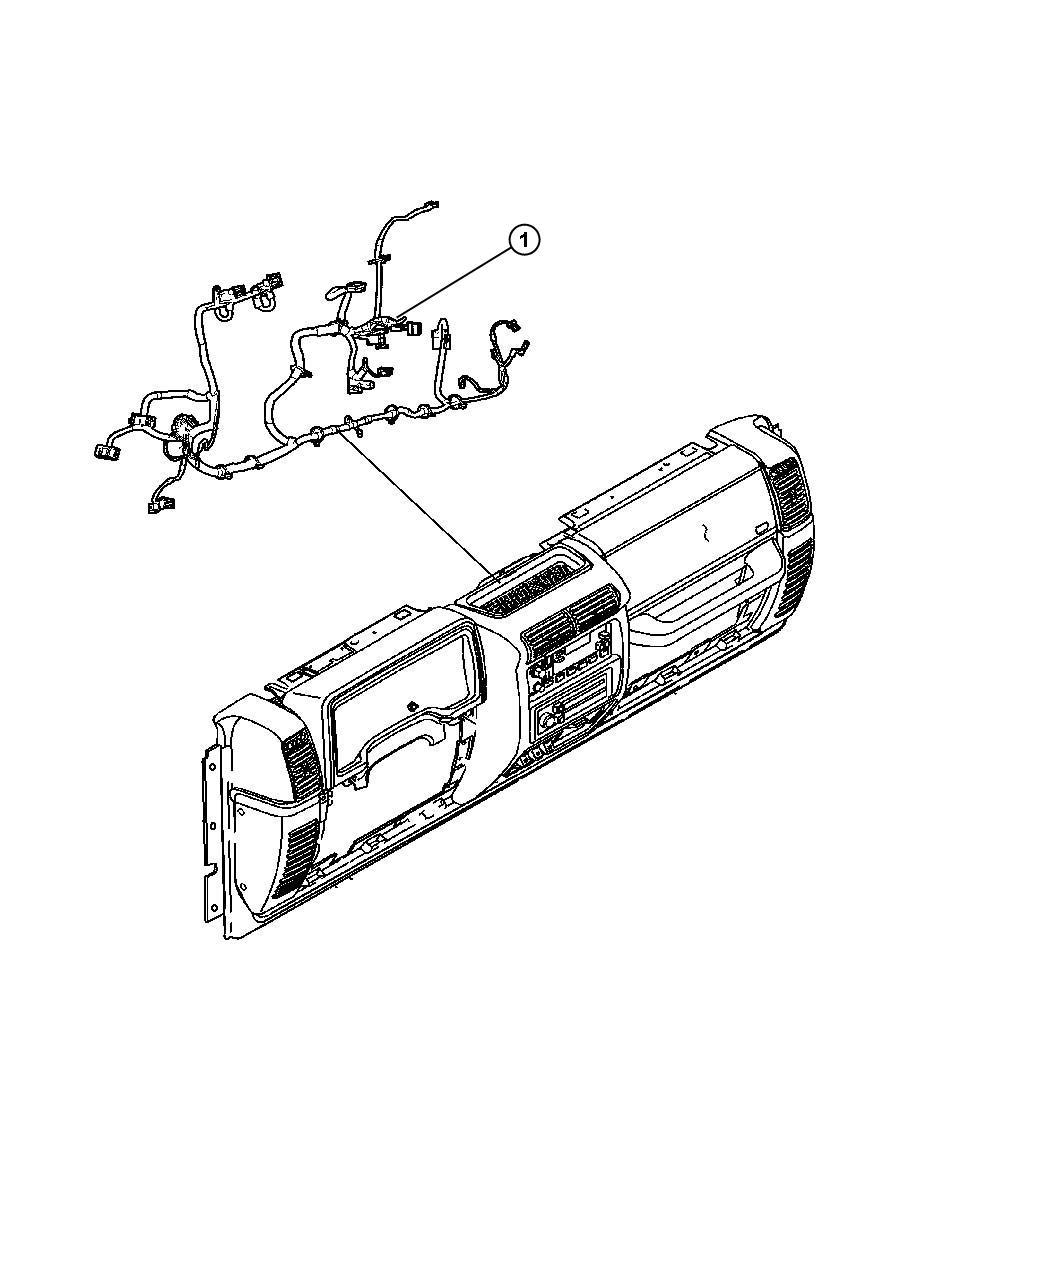 Jeep Wrangler Wiring. Instrument panel. Speakersalpine